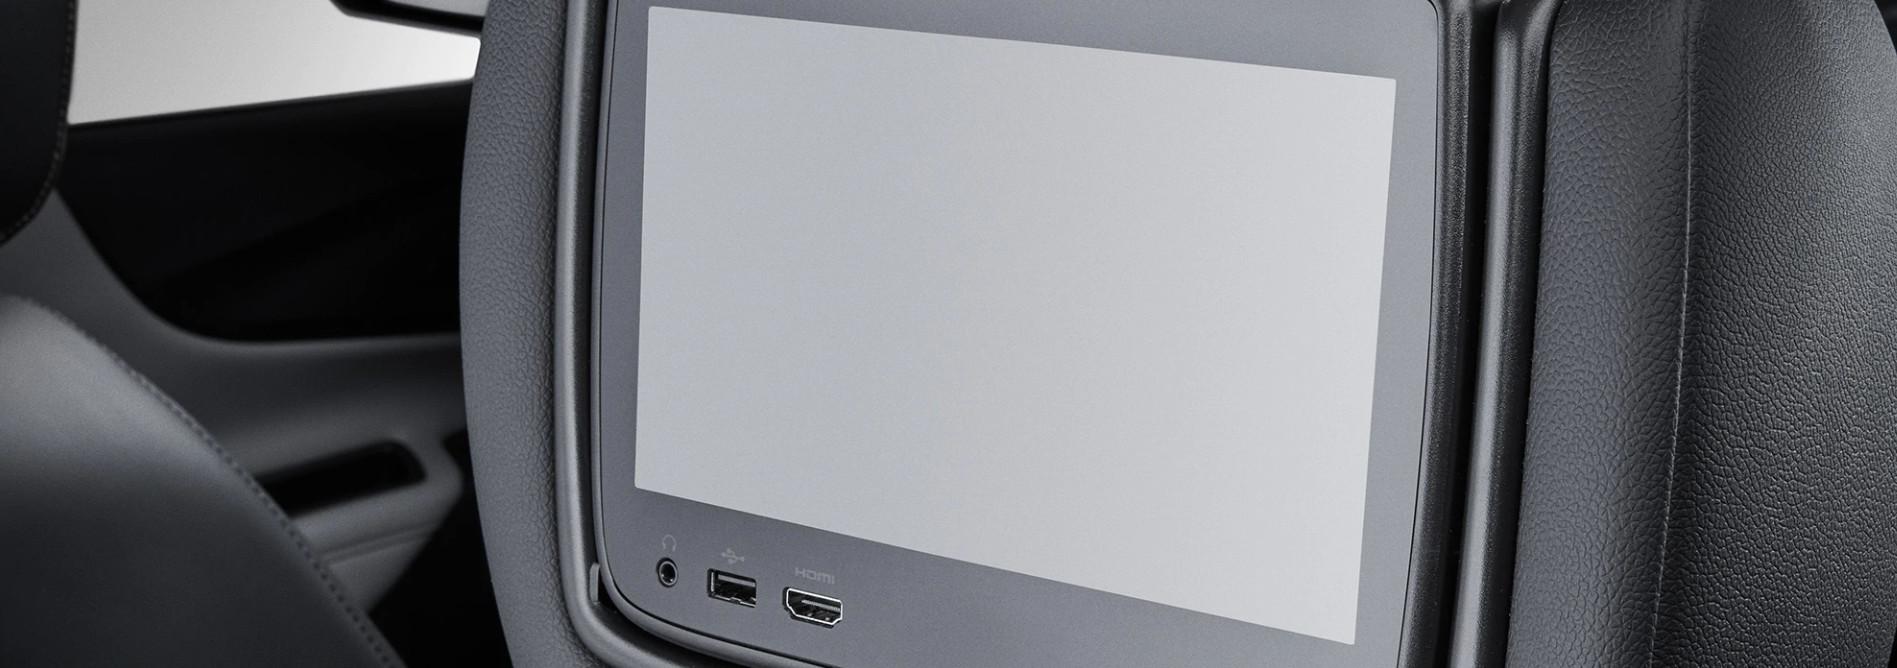 2020 Chevrolet Equinox Technology